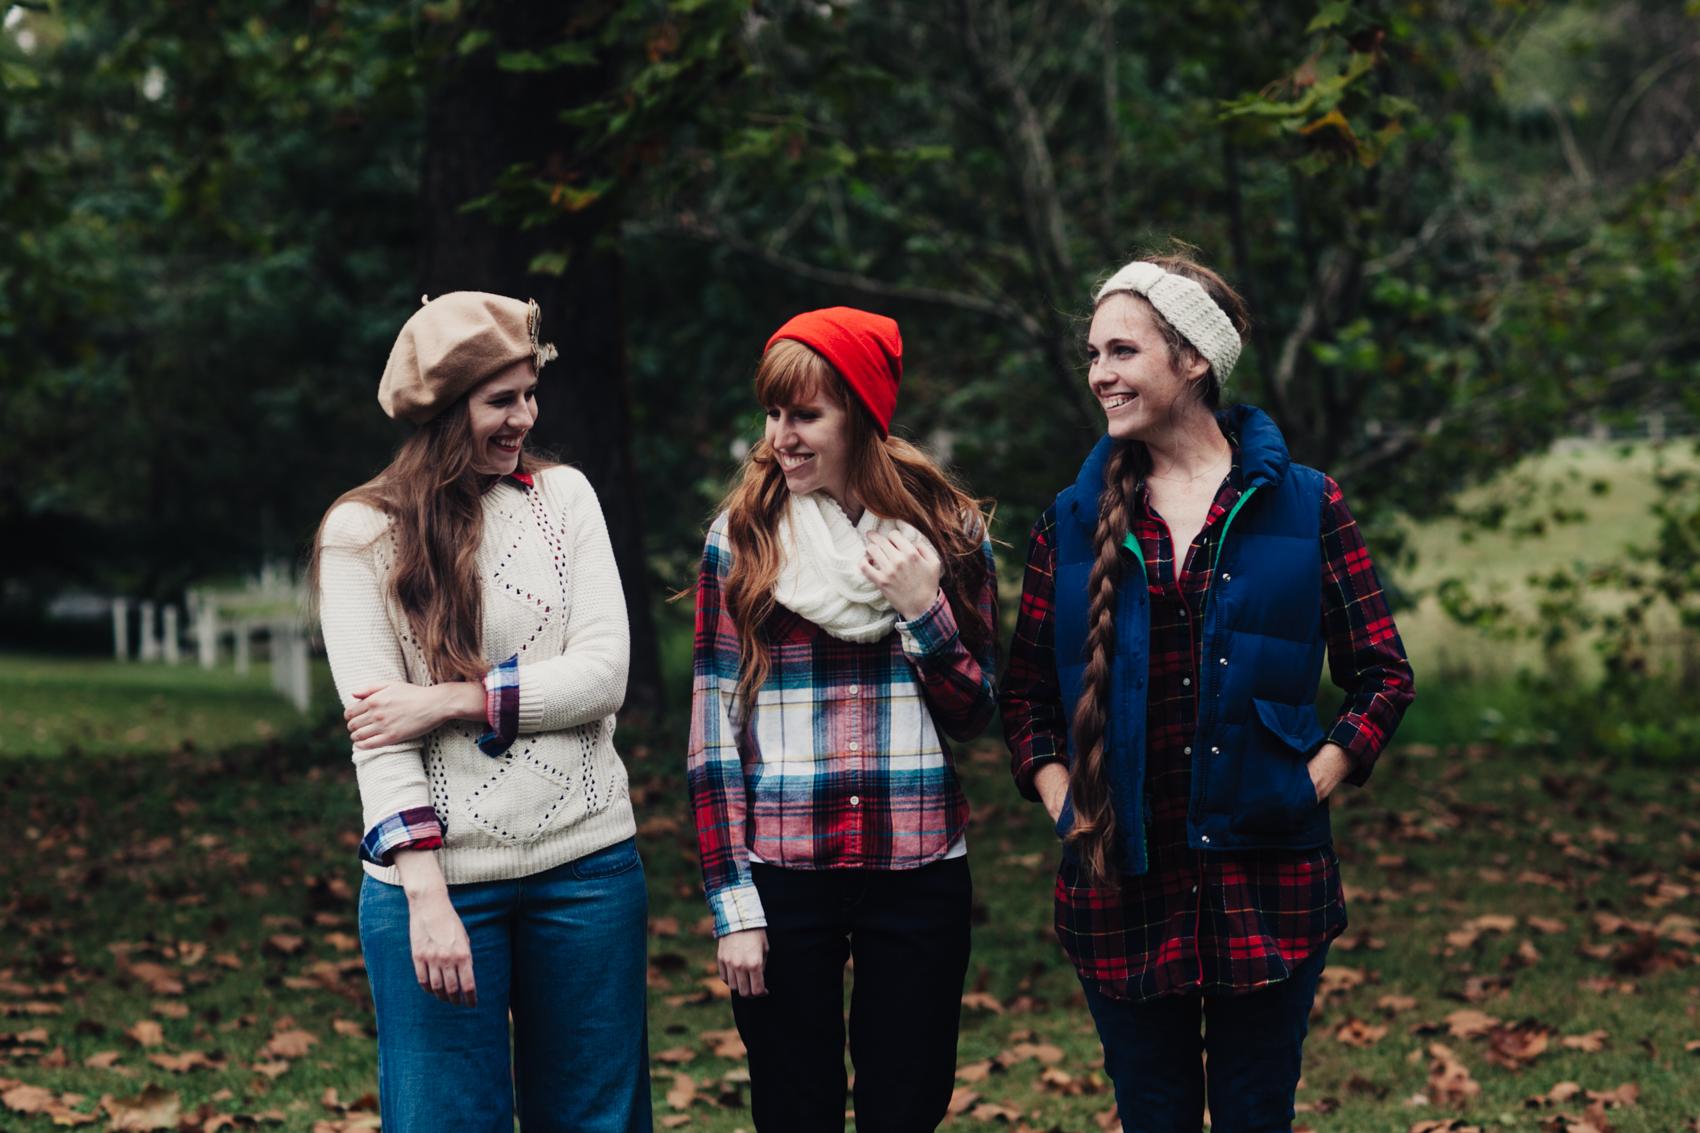 Longgirlsfallshoot2015-17